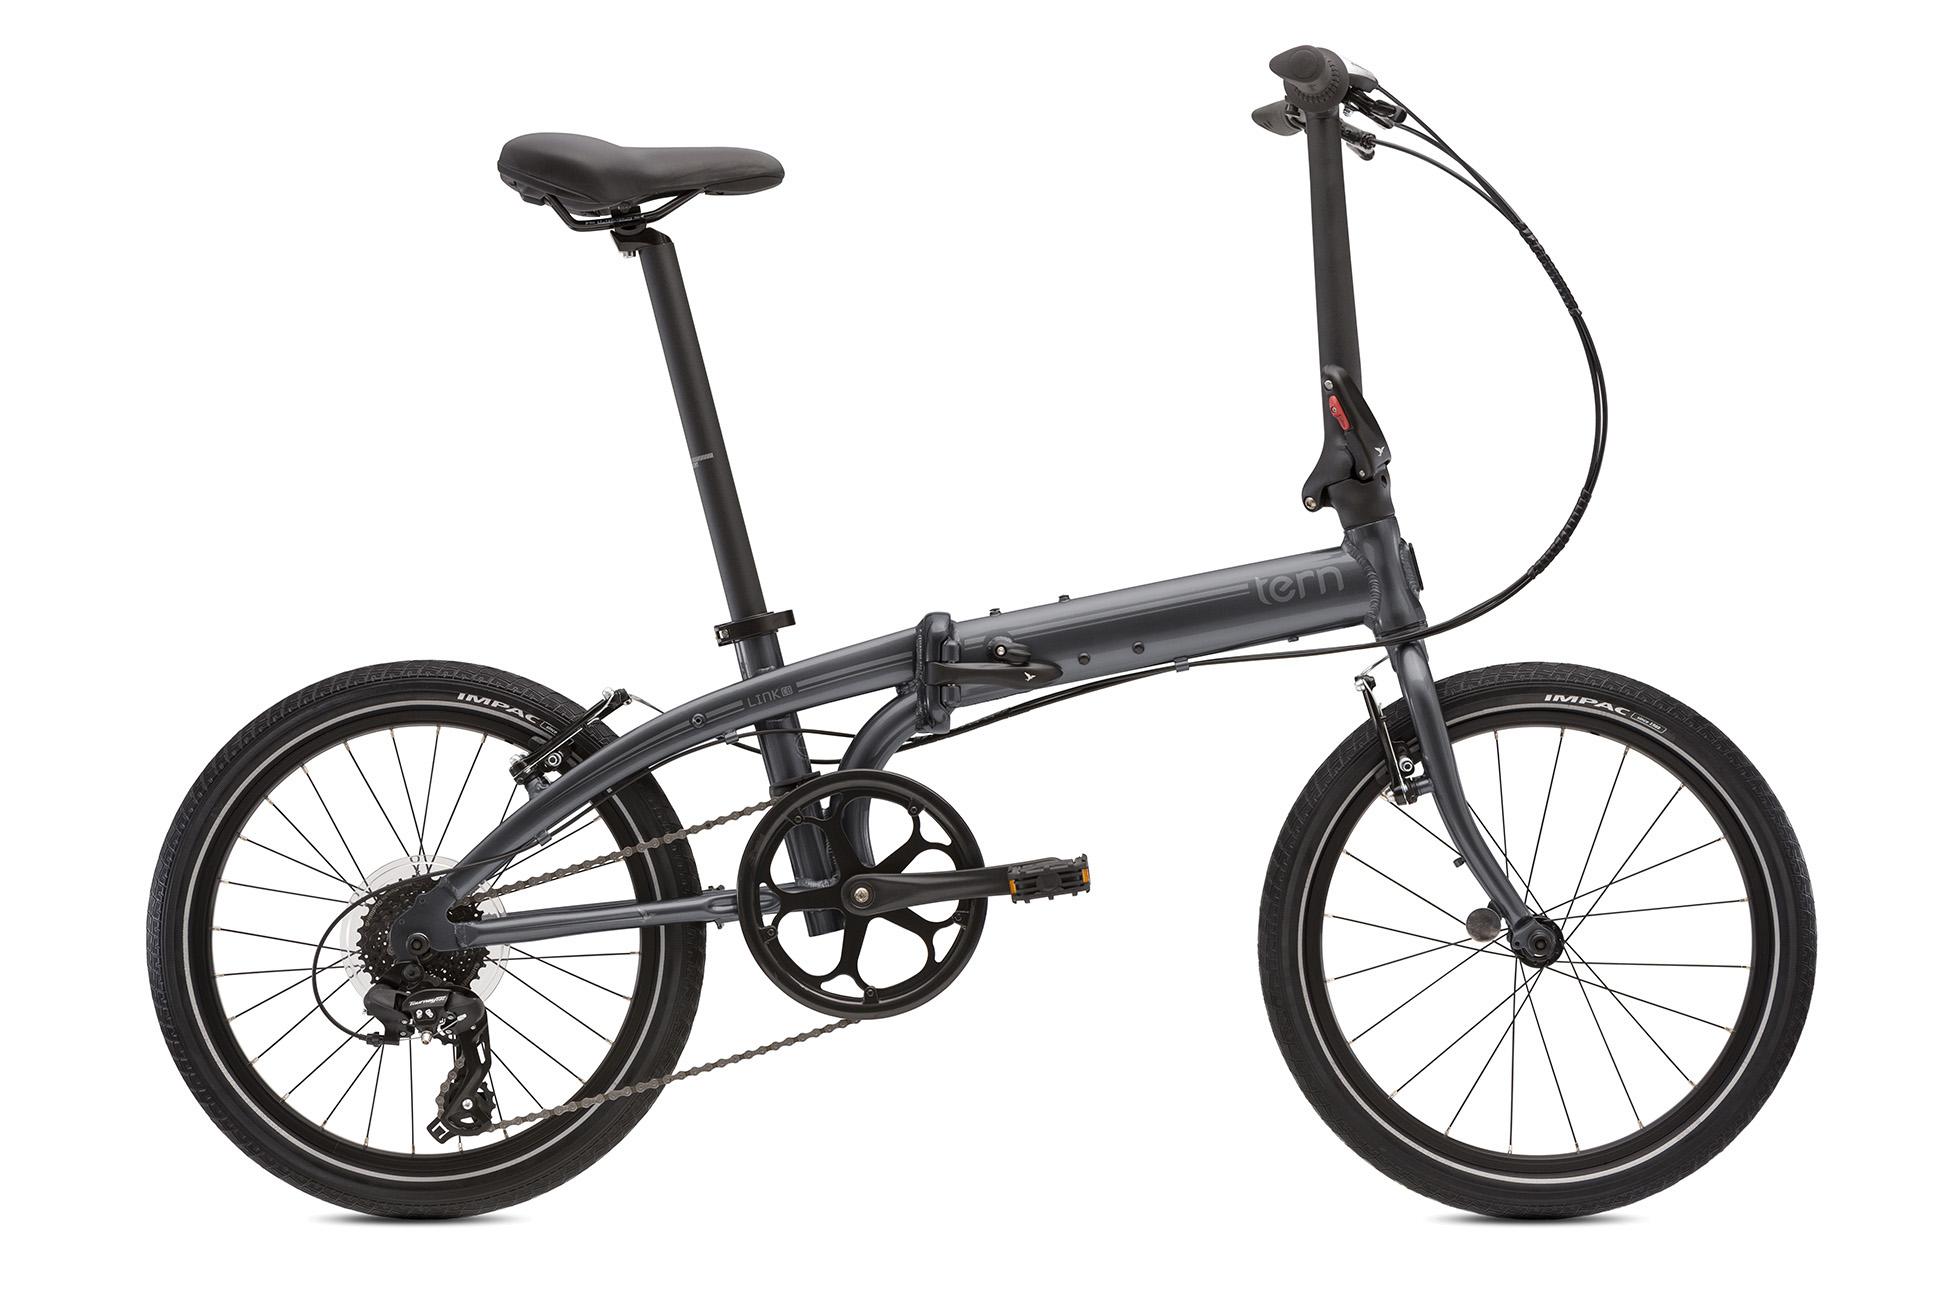 Tern C8, Belhaven Bikes, Dunbar, East Lothian, Folding bikes